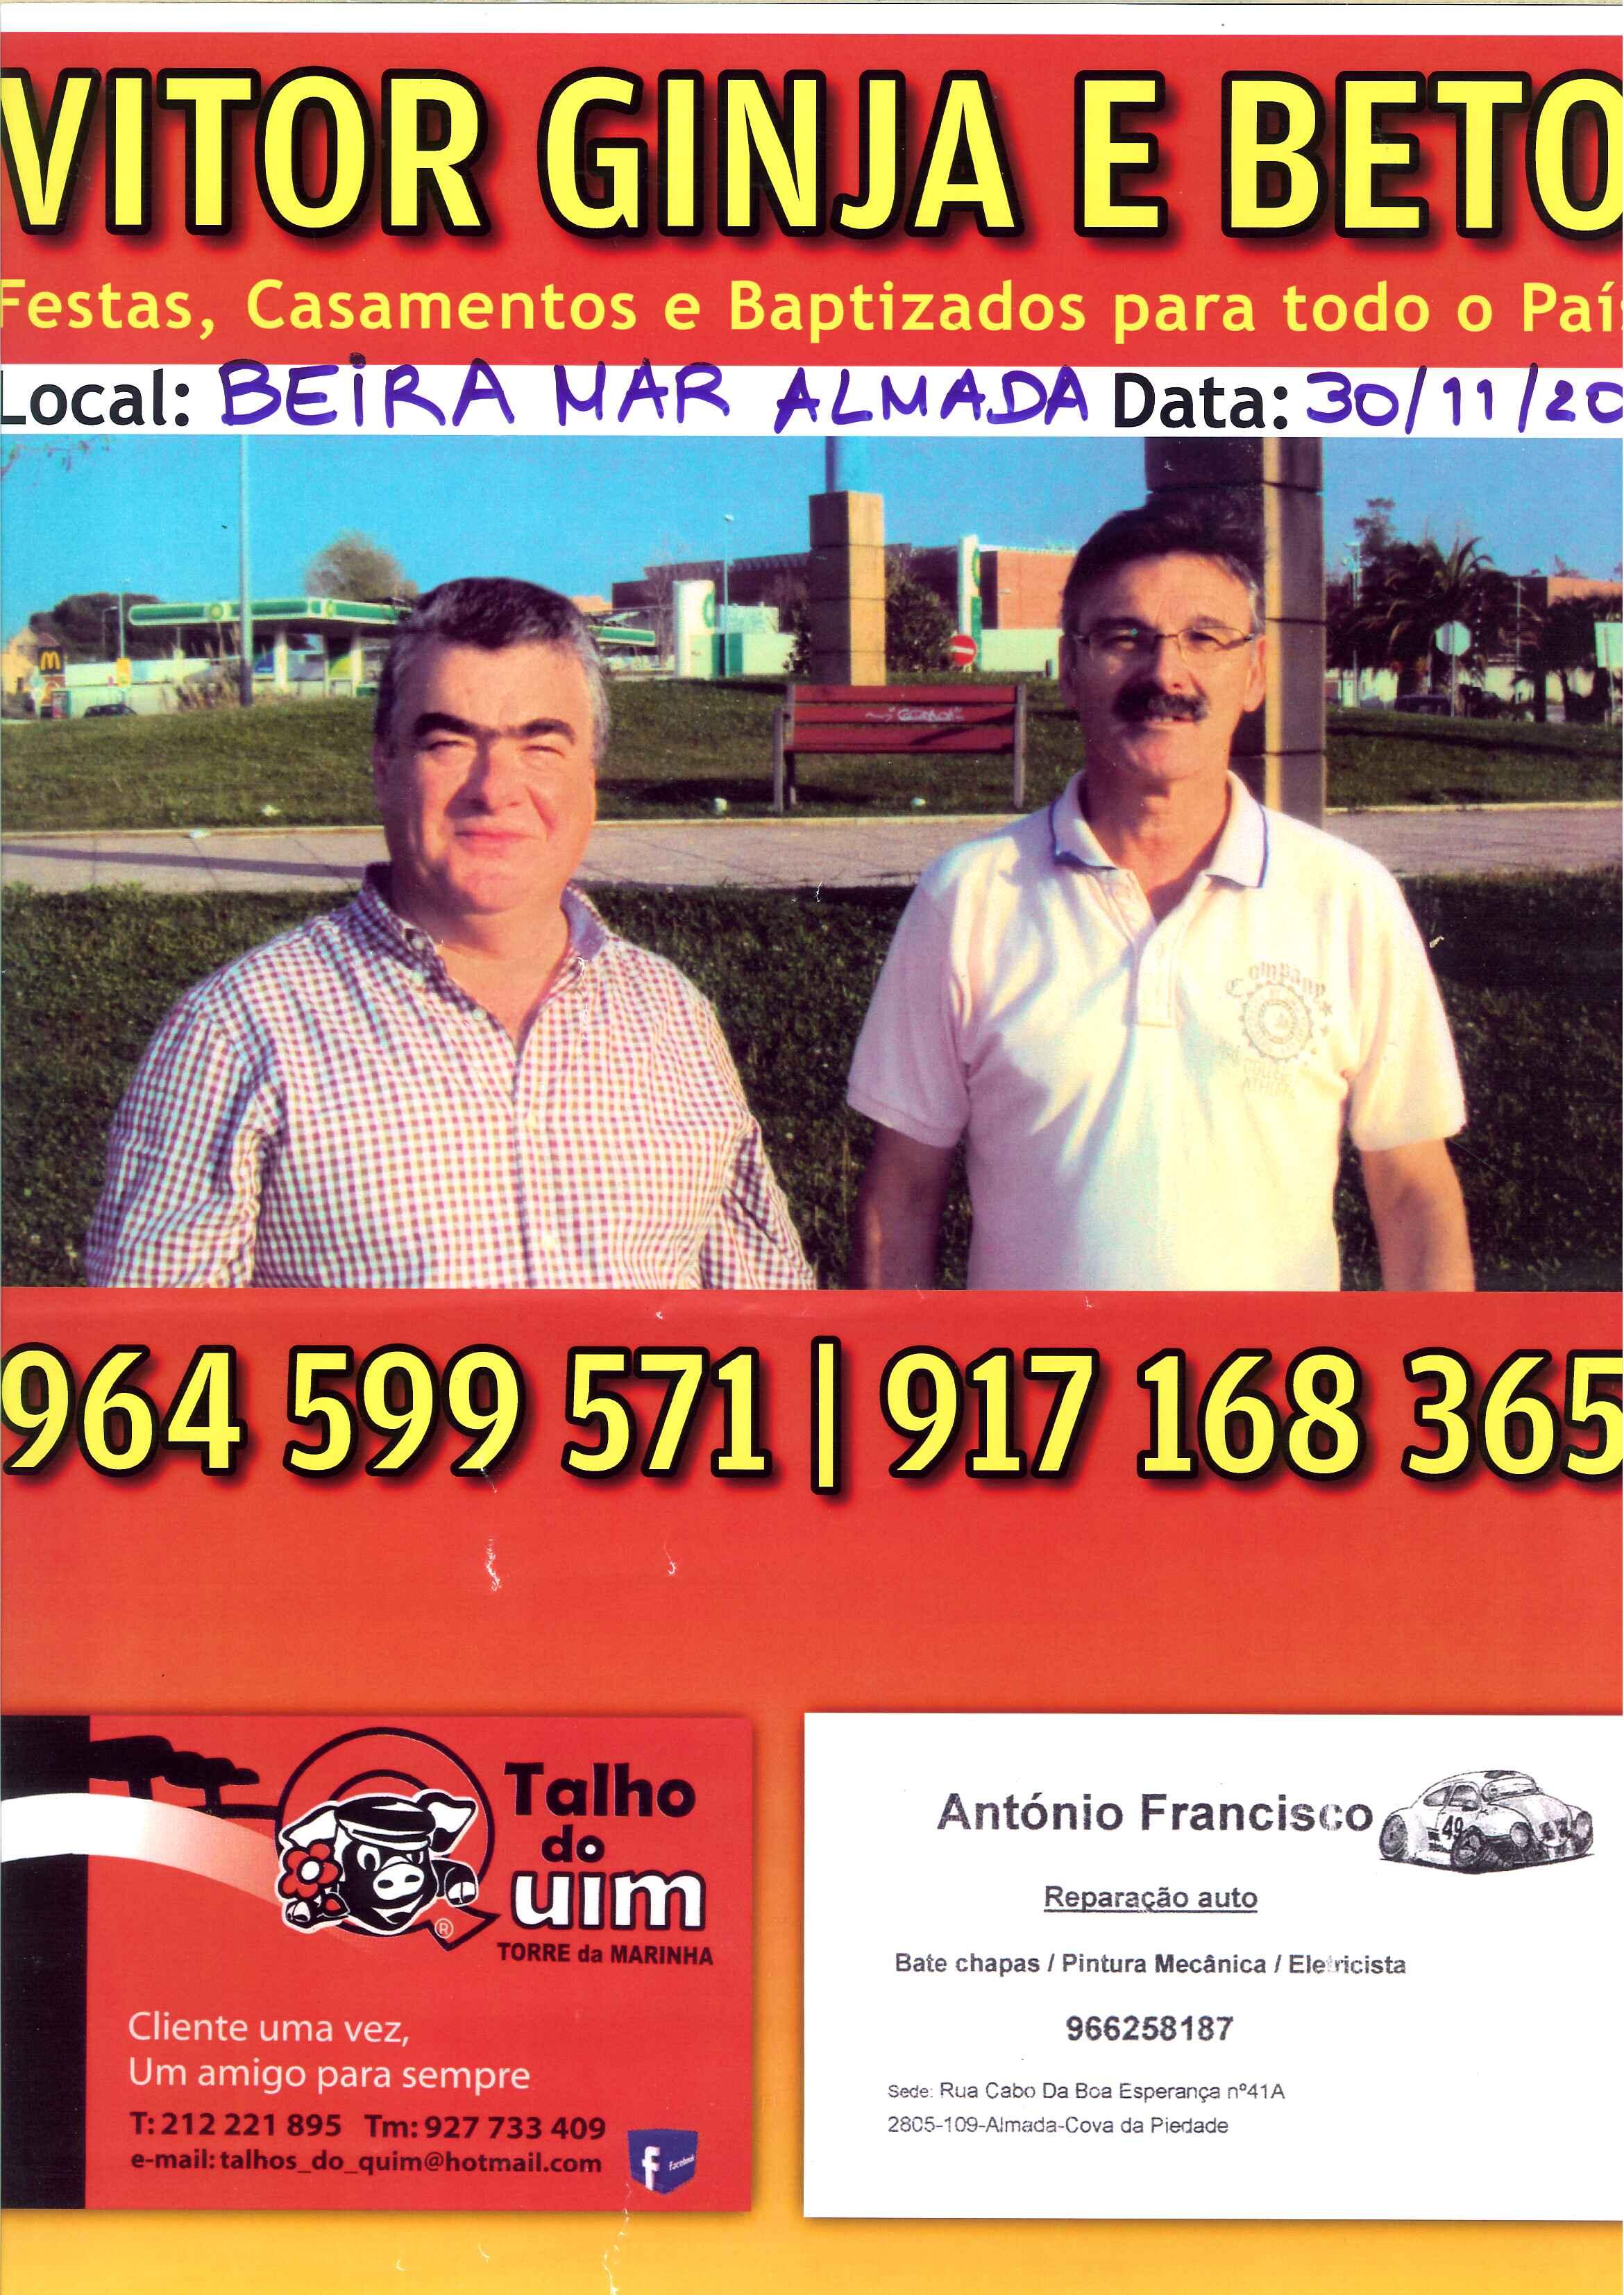 20141104143537503_0001(1)